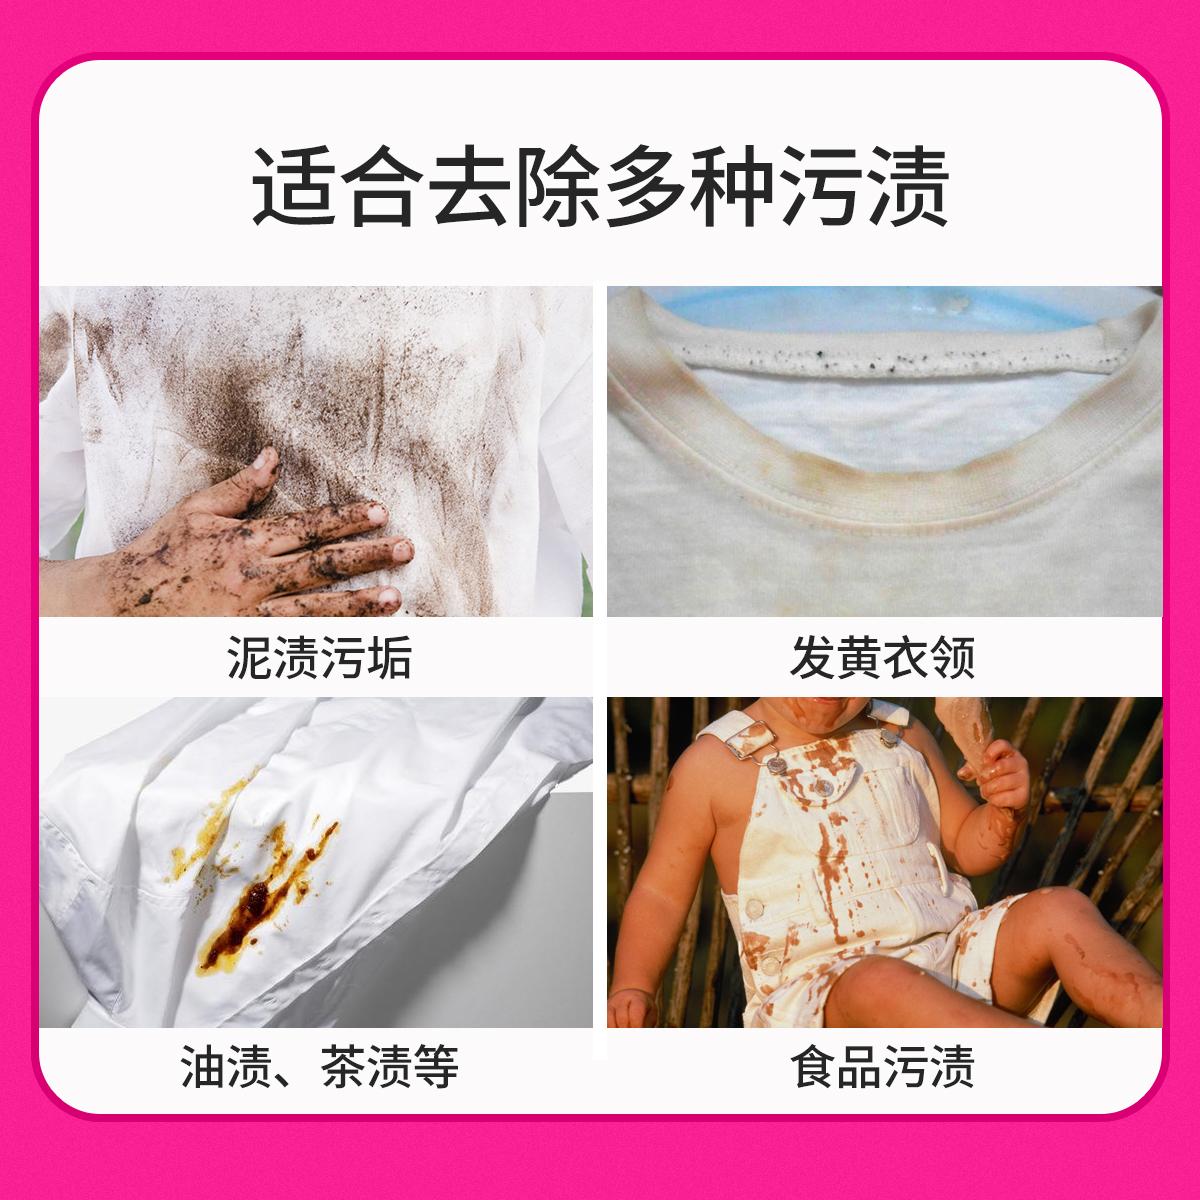 Vanish进口漂白粉白色衣服去黄增白去油污漂白剂衣物去渍神器组合